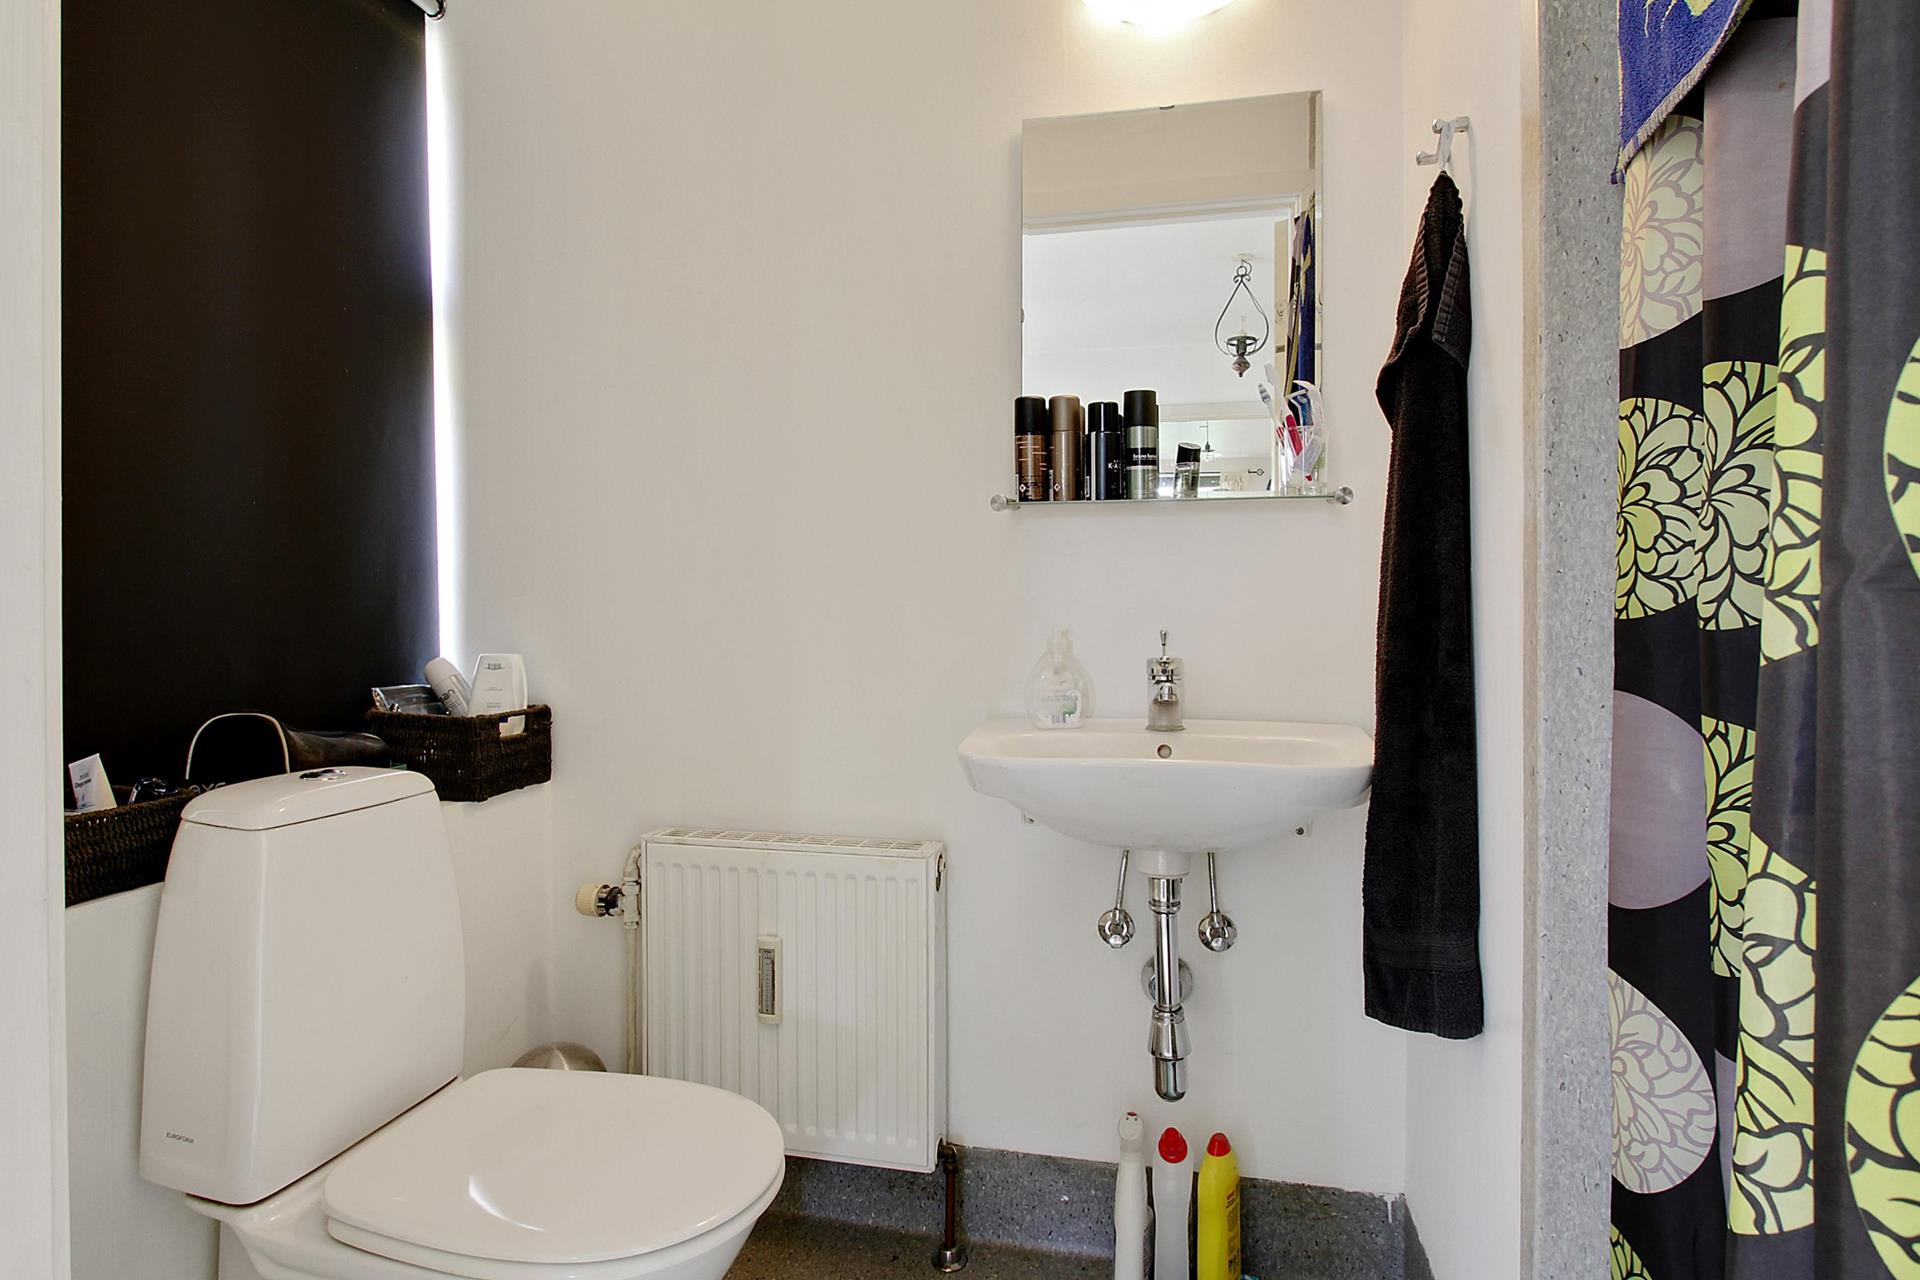 Bolig/erhverv på Algade i Skælskør - Toilet